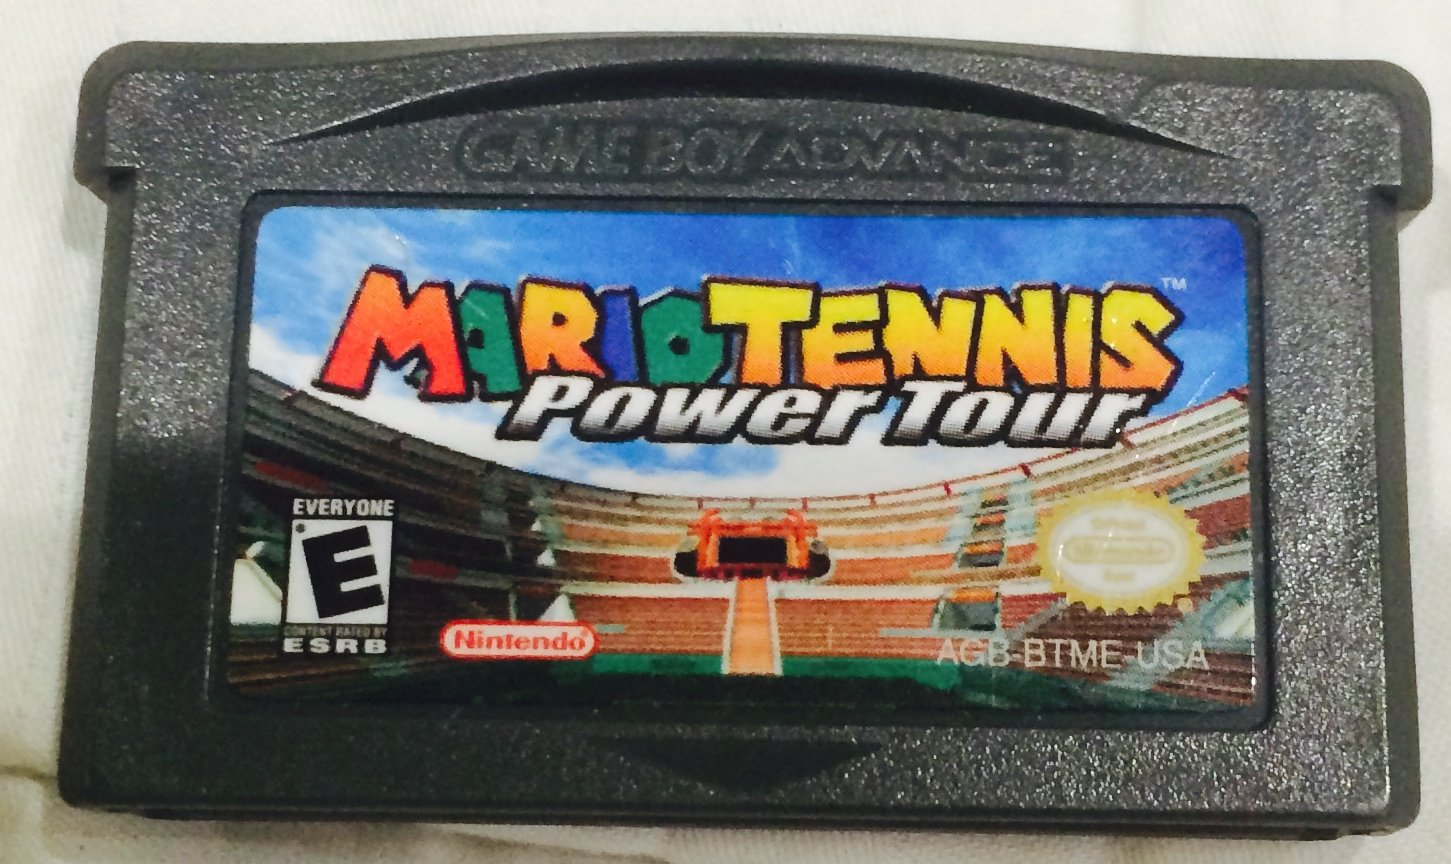 Mario tennis download gba   Mario Power Tennis (Europe) GBA